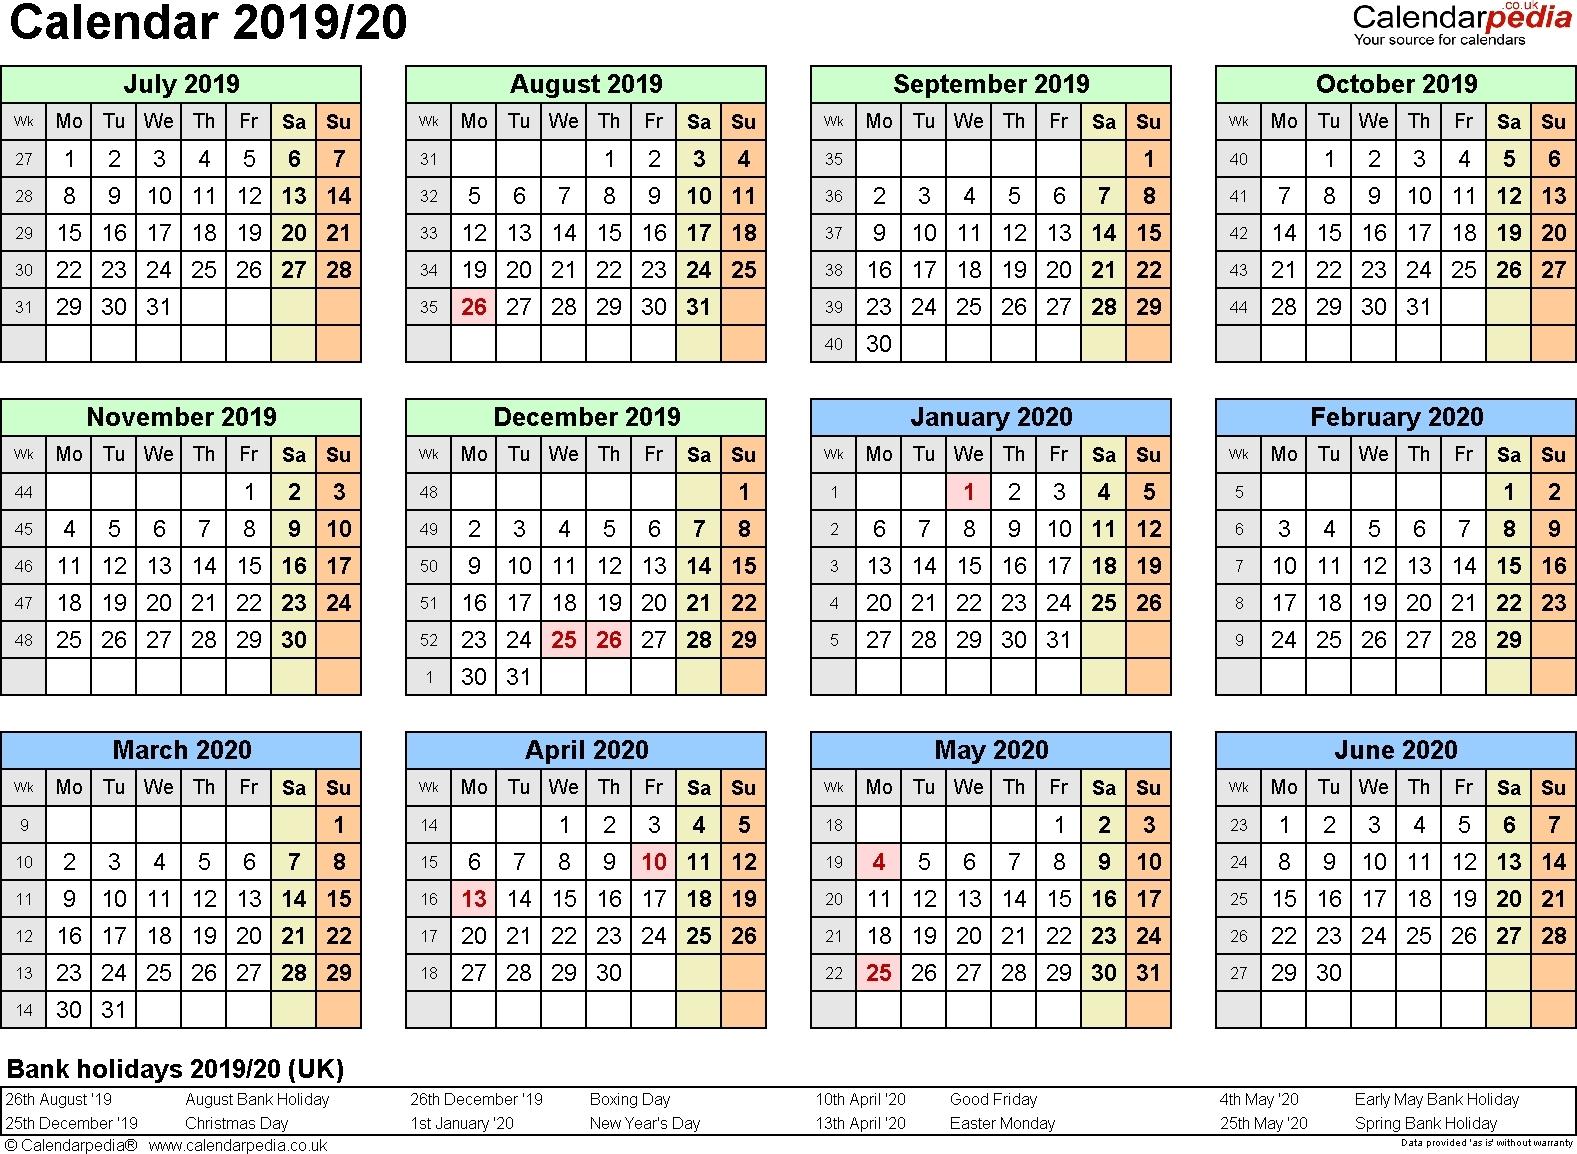 Extraordinary Calendar 2019 And 2020 Nz • Printable Blank Calendar_School Calendar Nz 2020